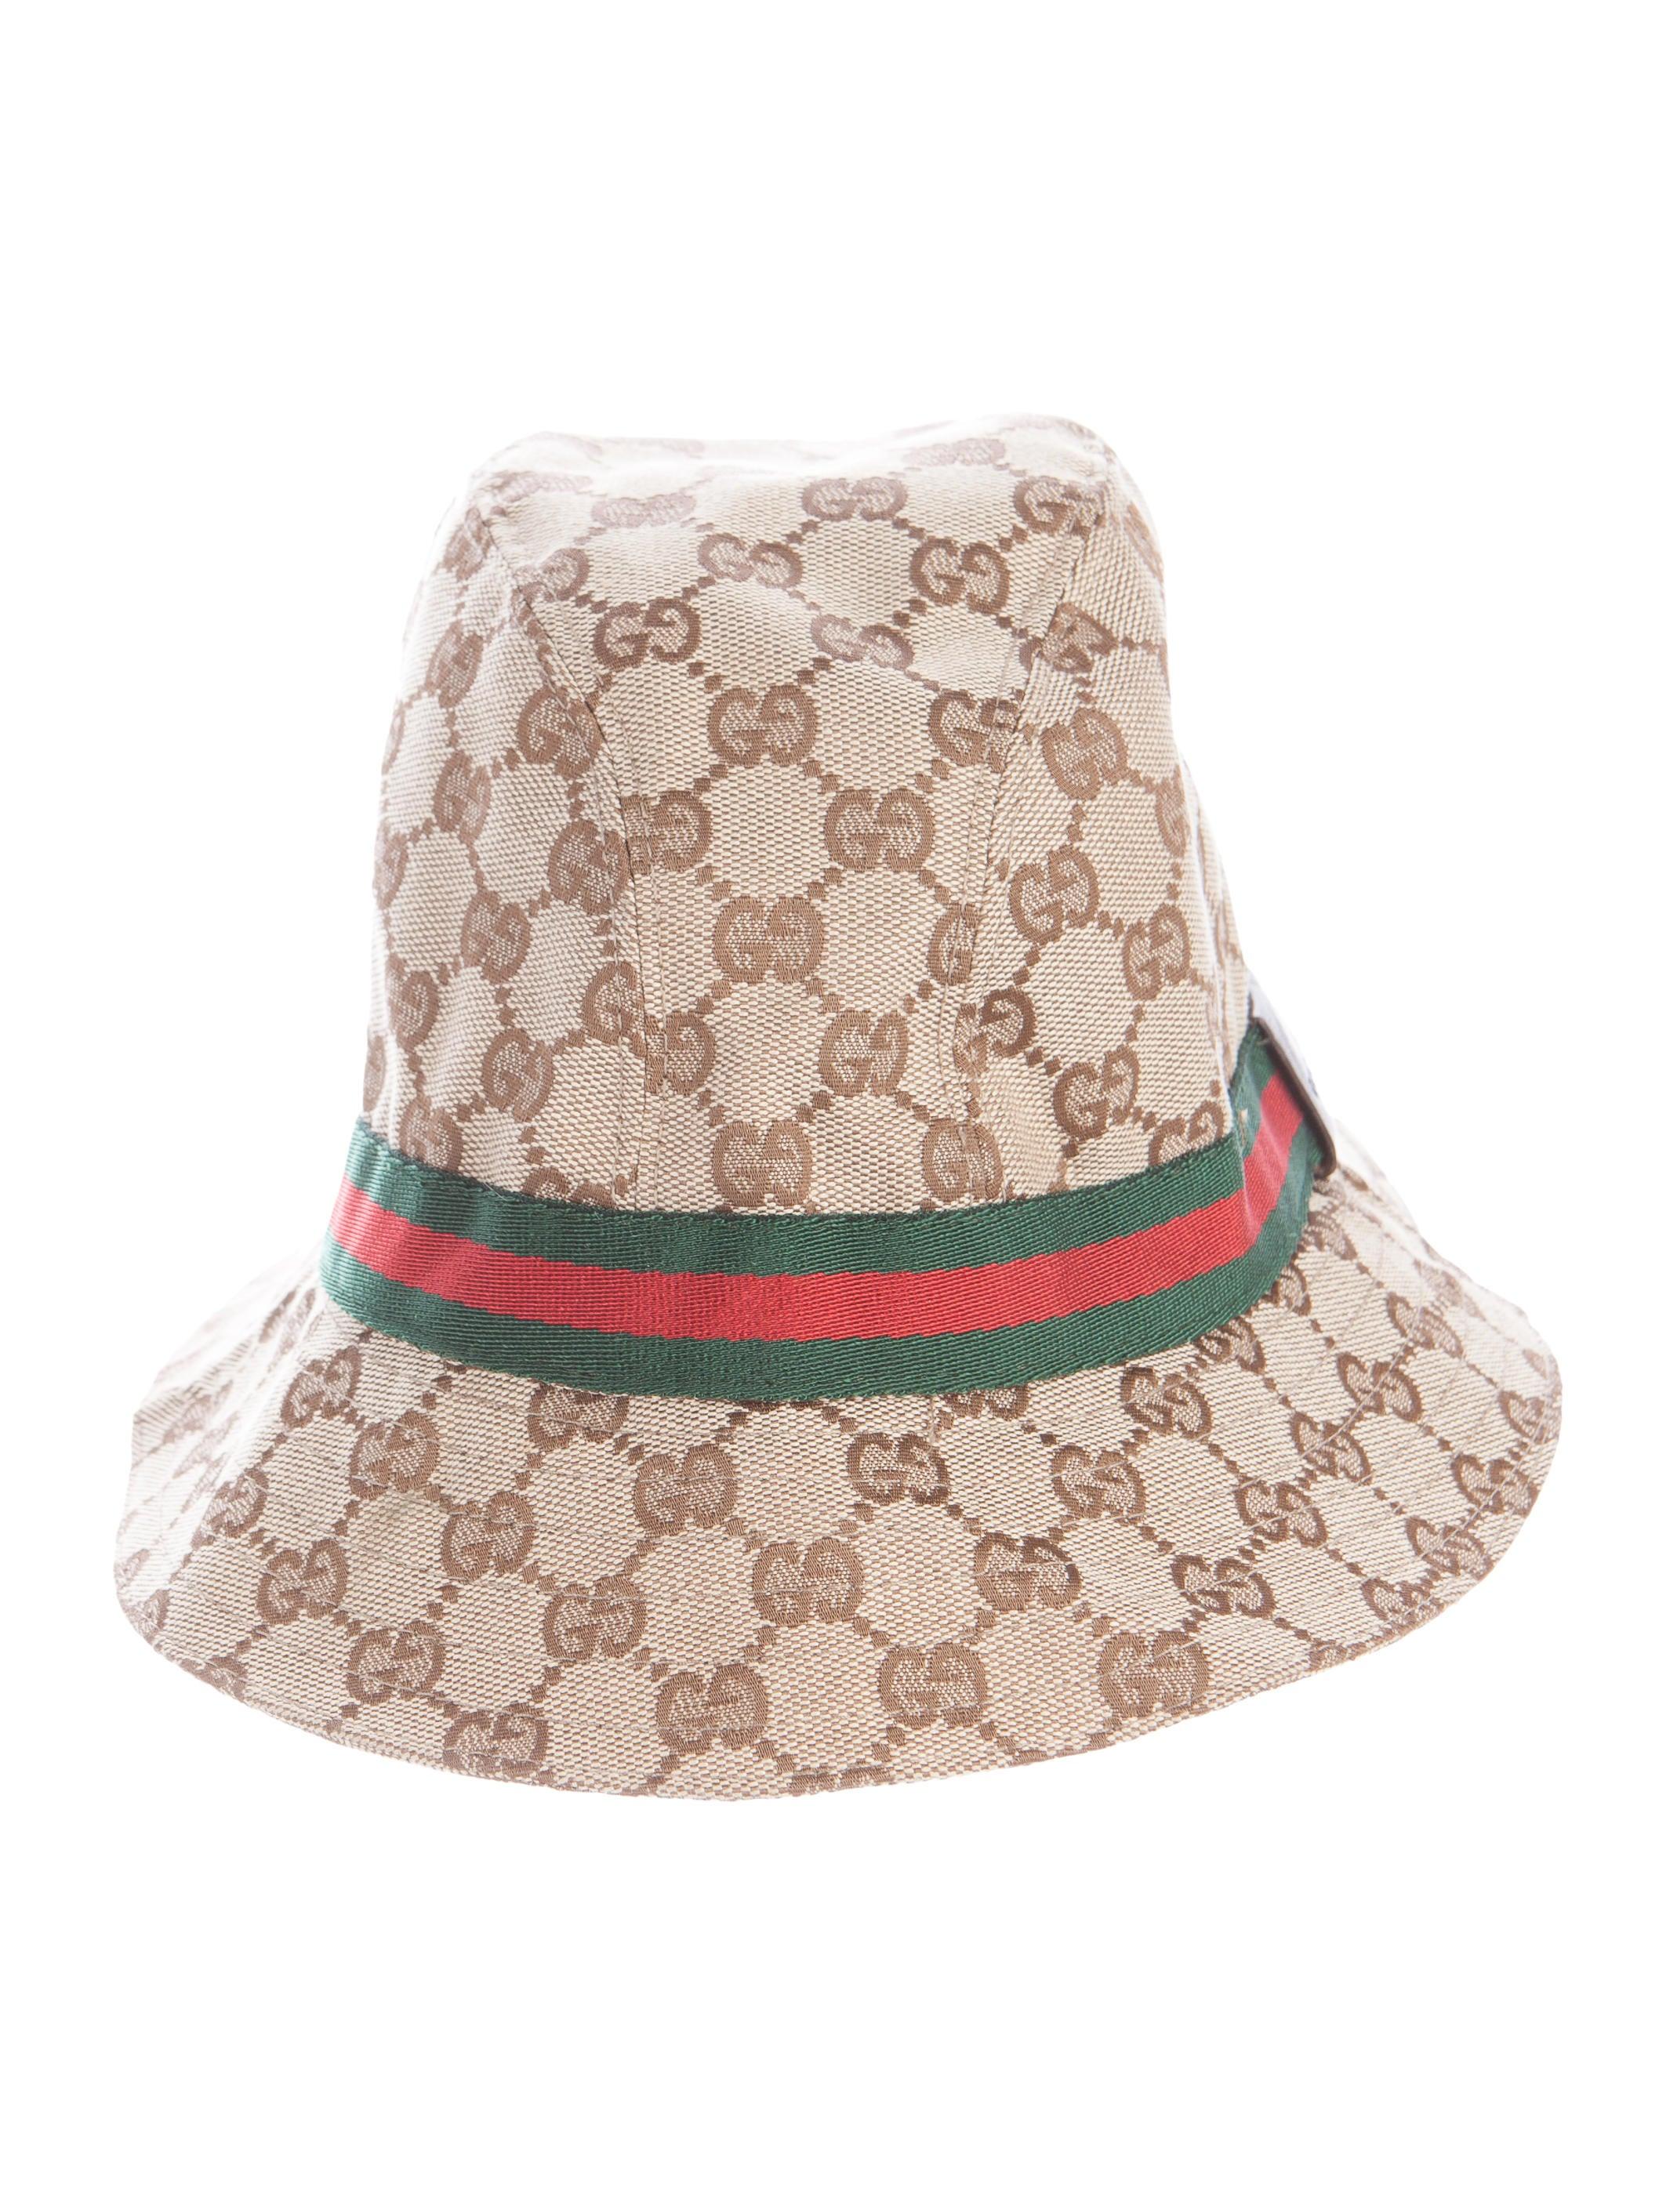 f35200ba3f1 Pictures of Gucci Bucket Hat Mens - www.kidskunst.info